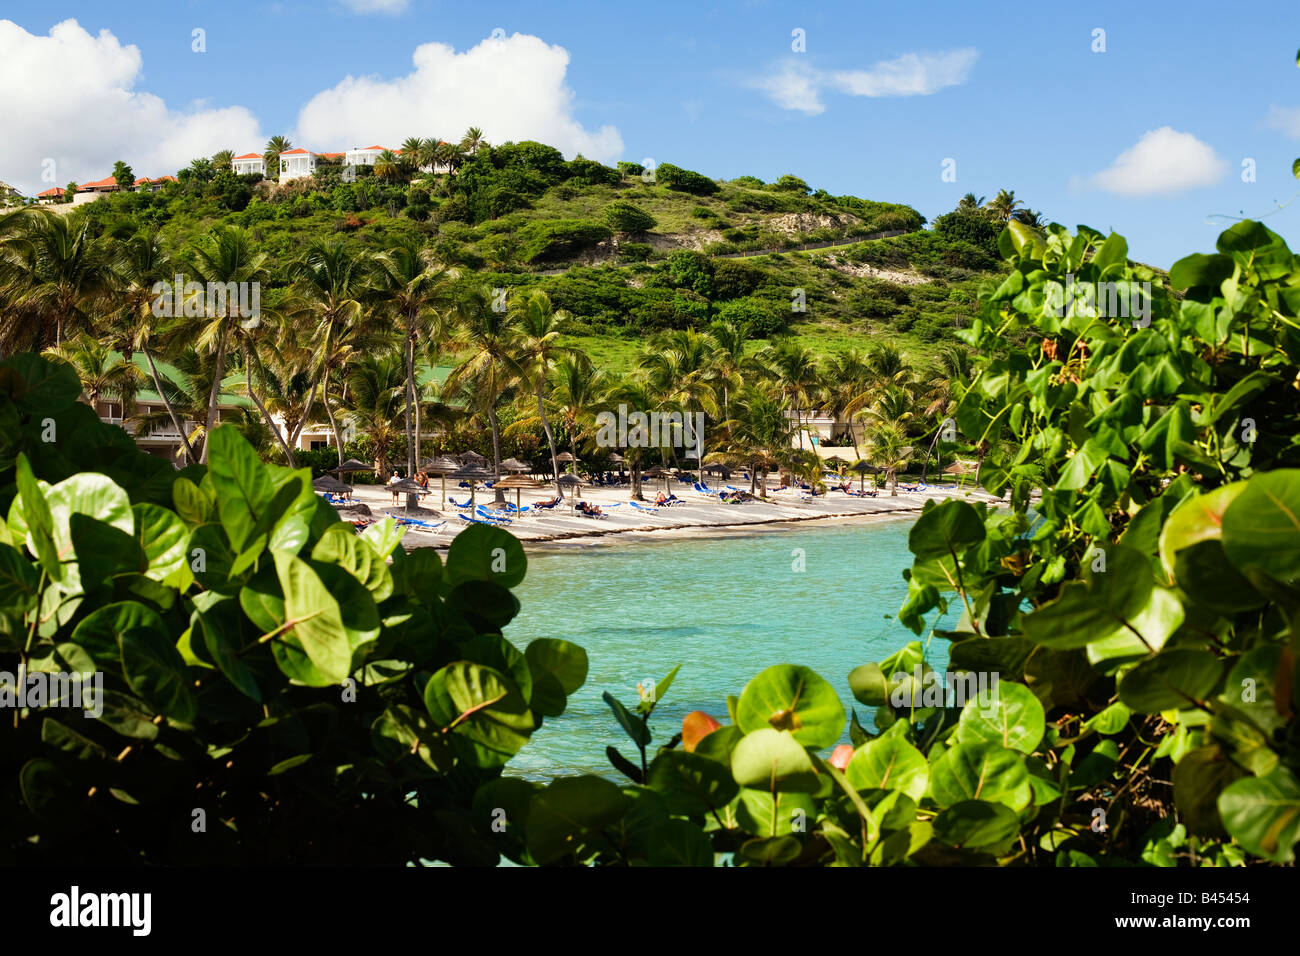 The St James's Beach Club on the Caribbean island of Antigua - Stock Image